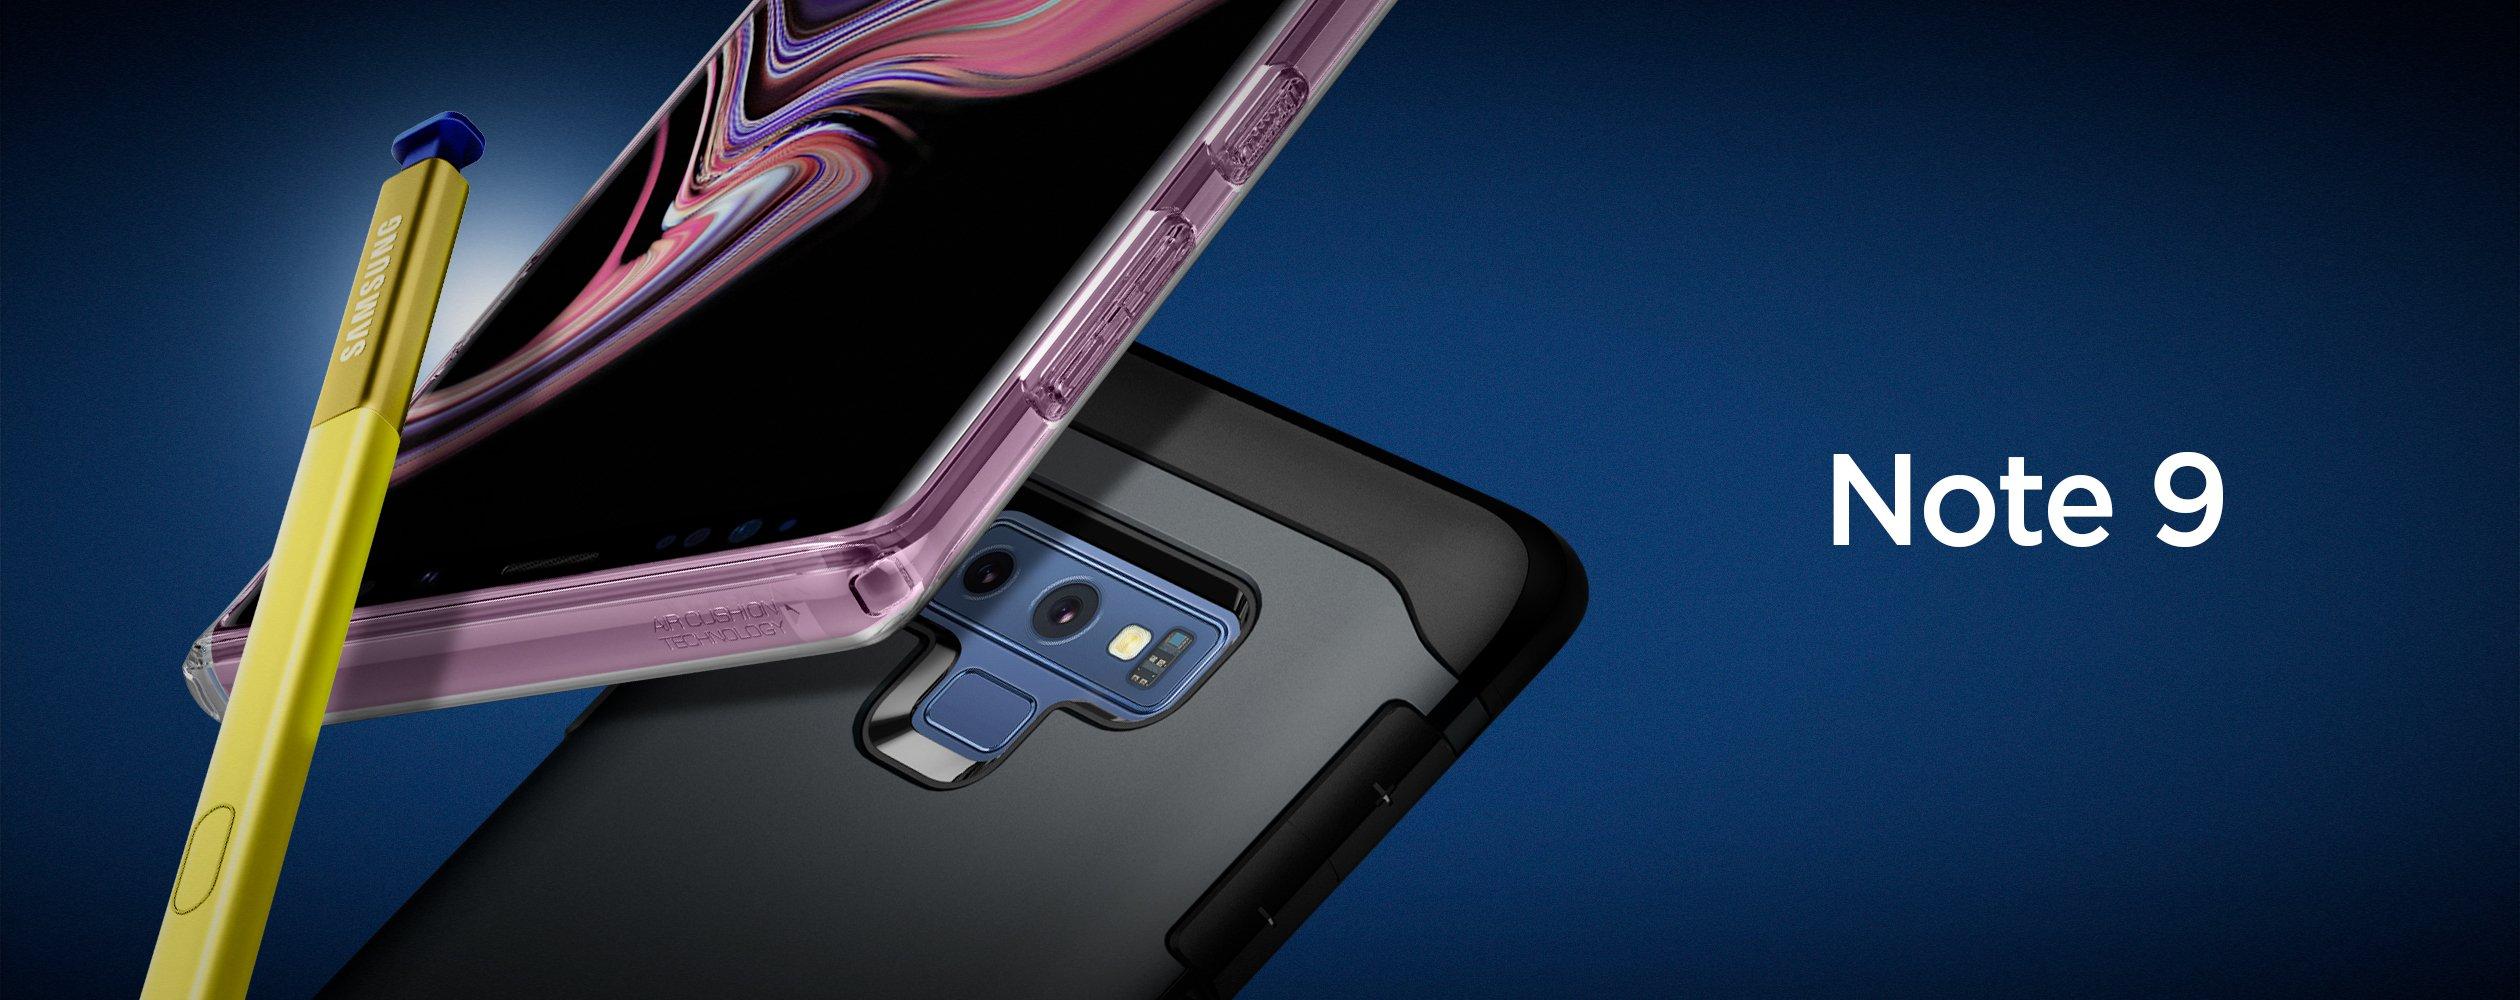 wholesale dealer 155de 8a641 Samsung Galaxy Note 9